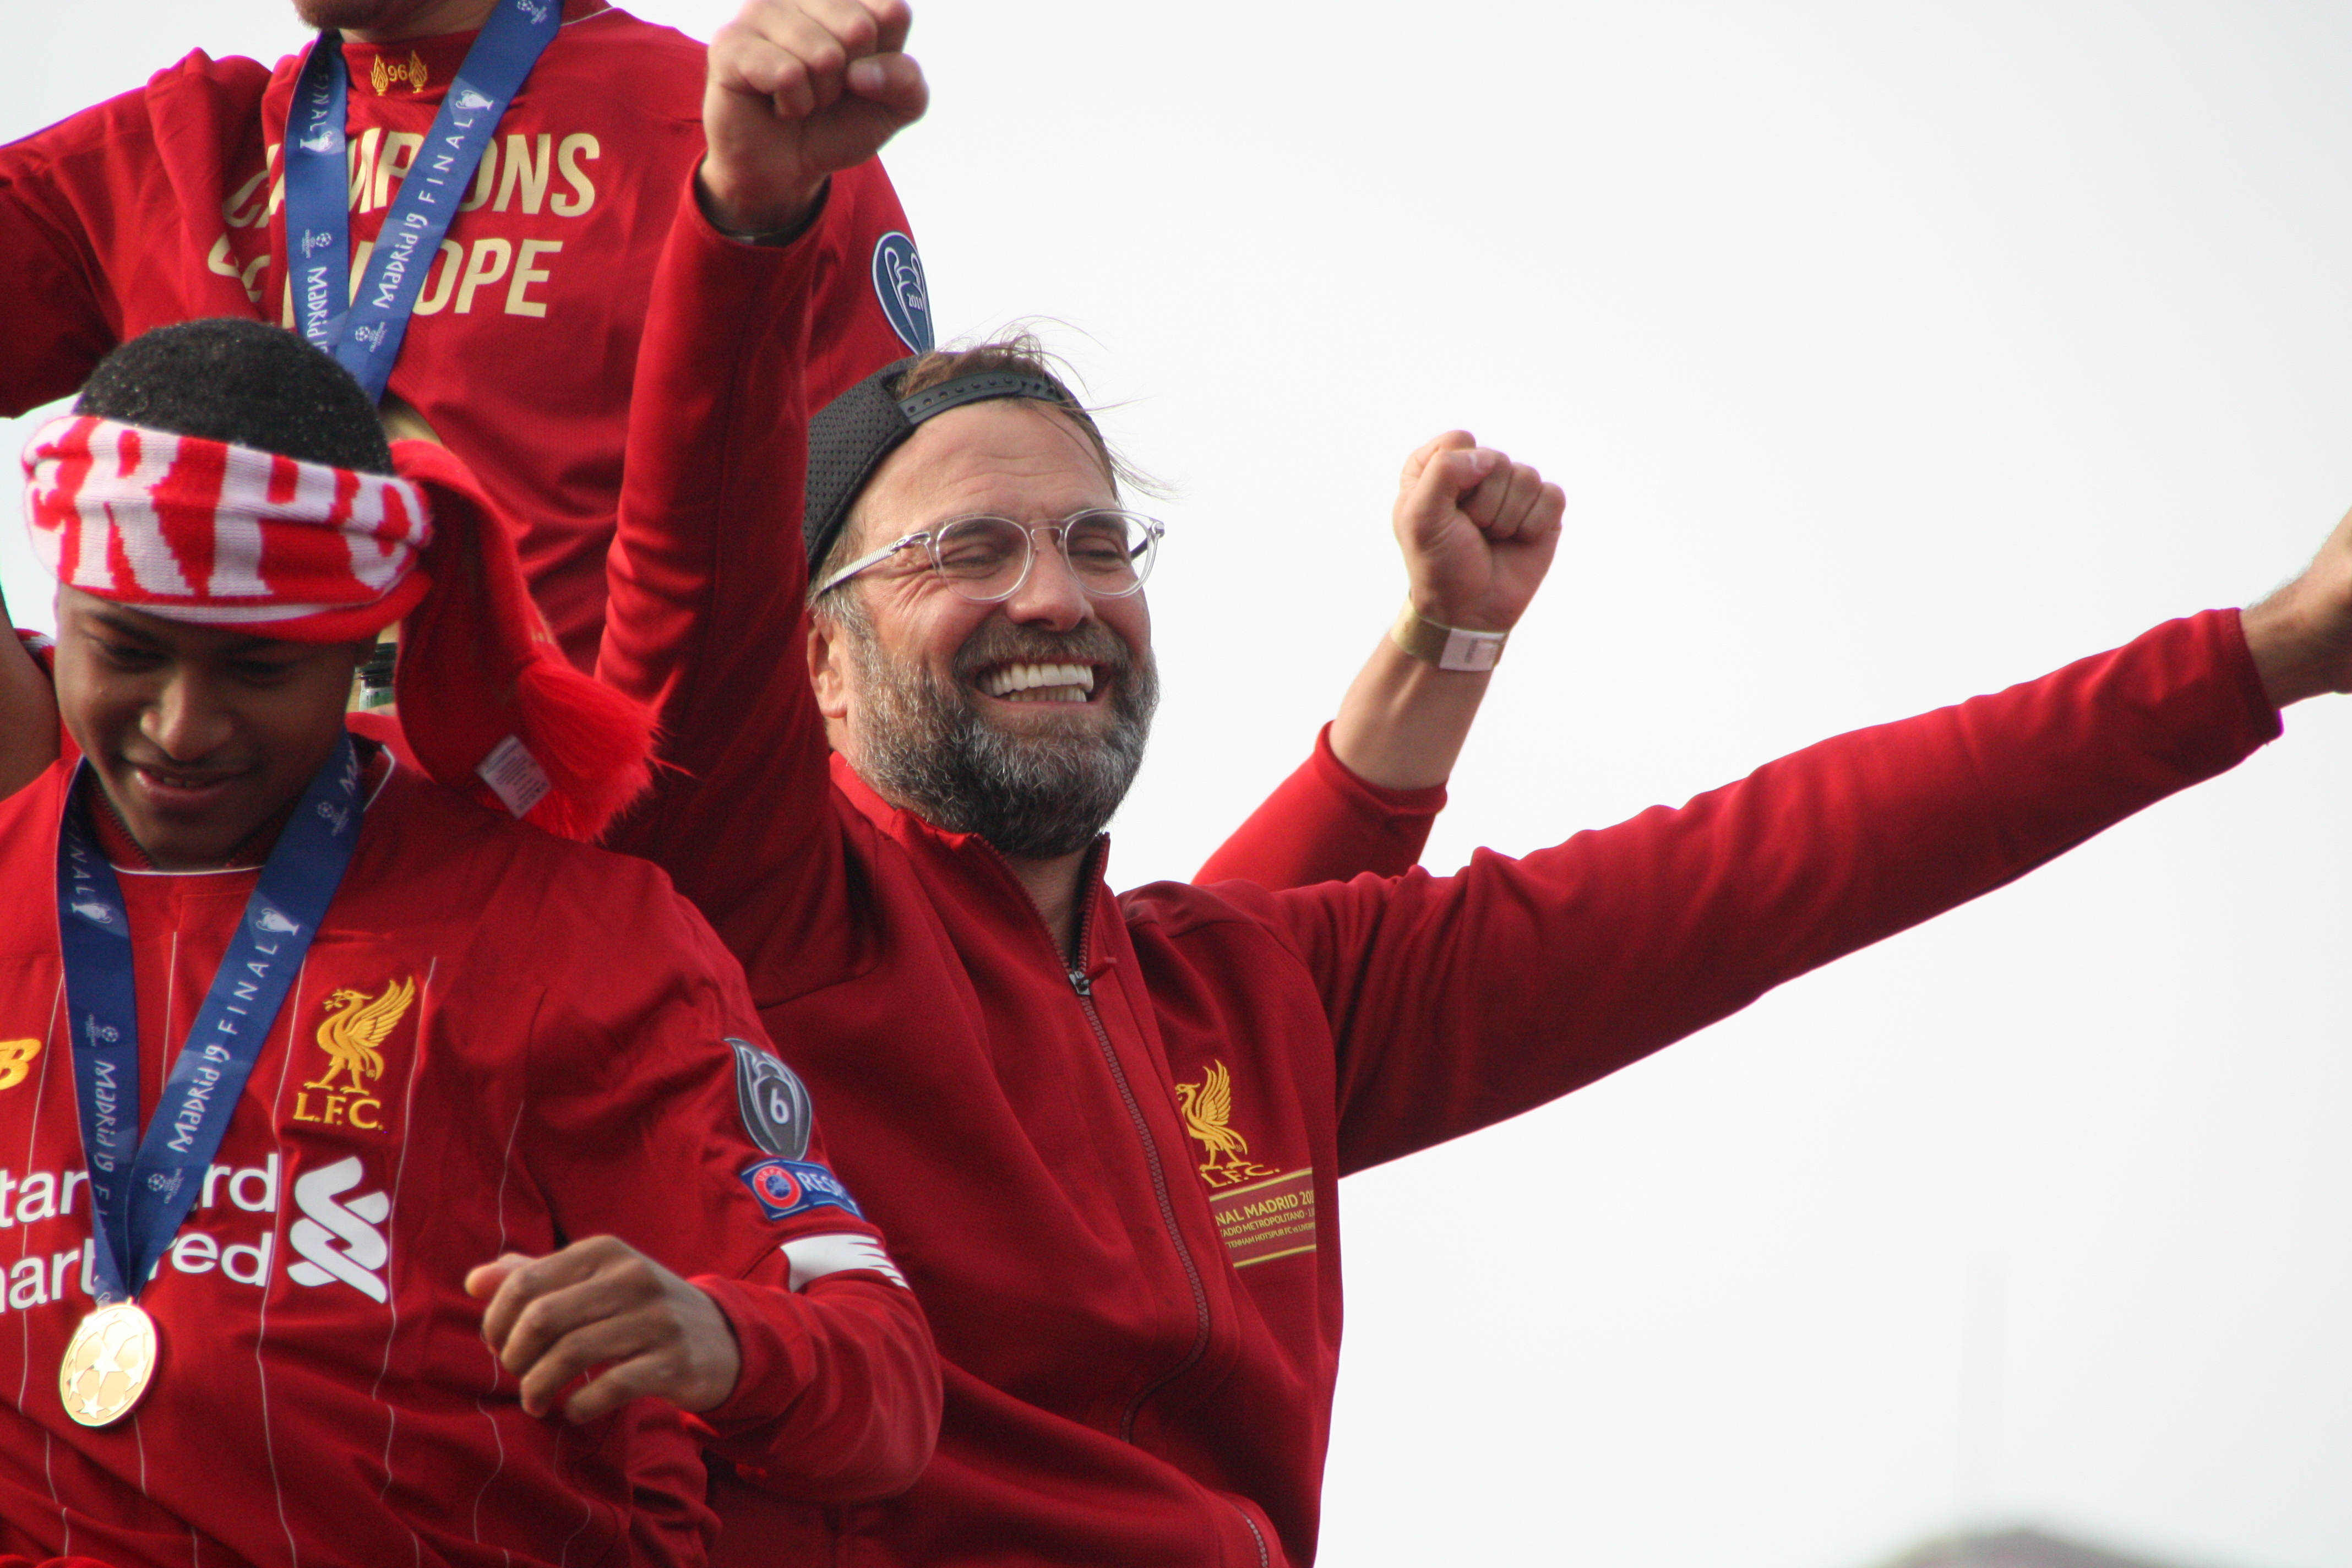 File:Jurgen Klopp LFC Parade 2019.jpg - Wikimedia Commons